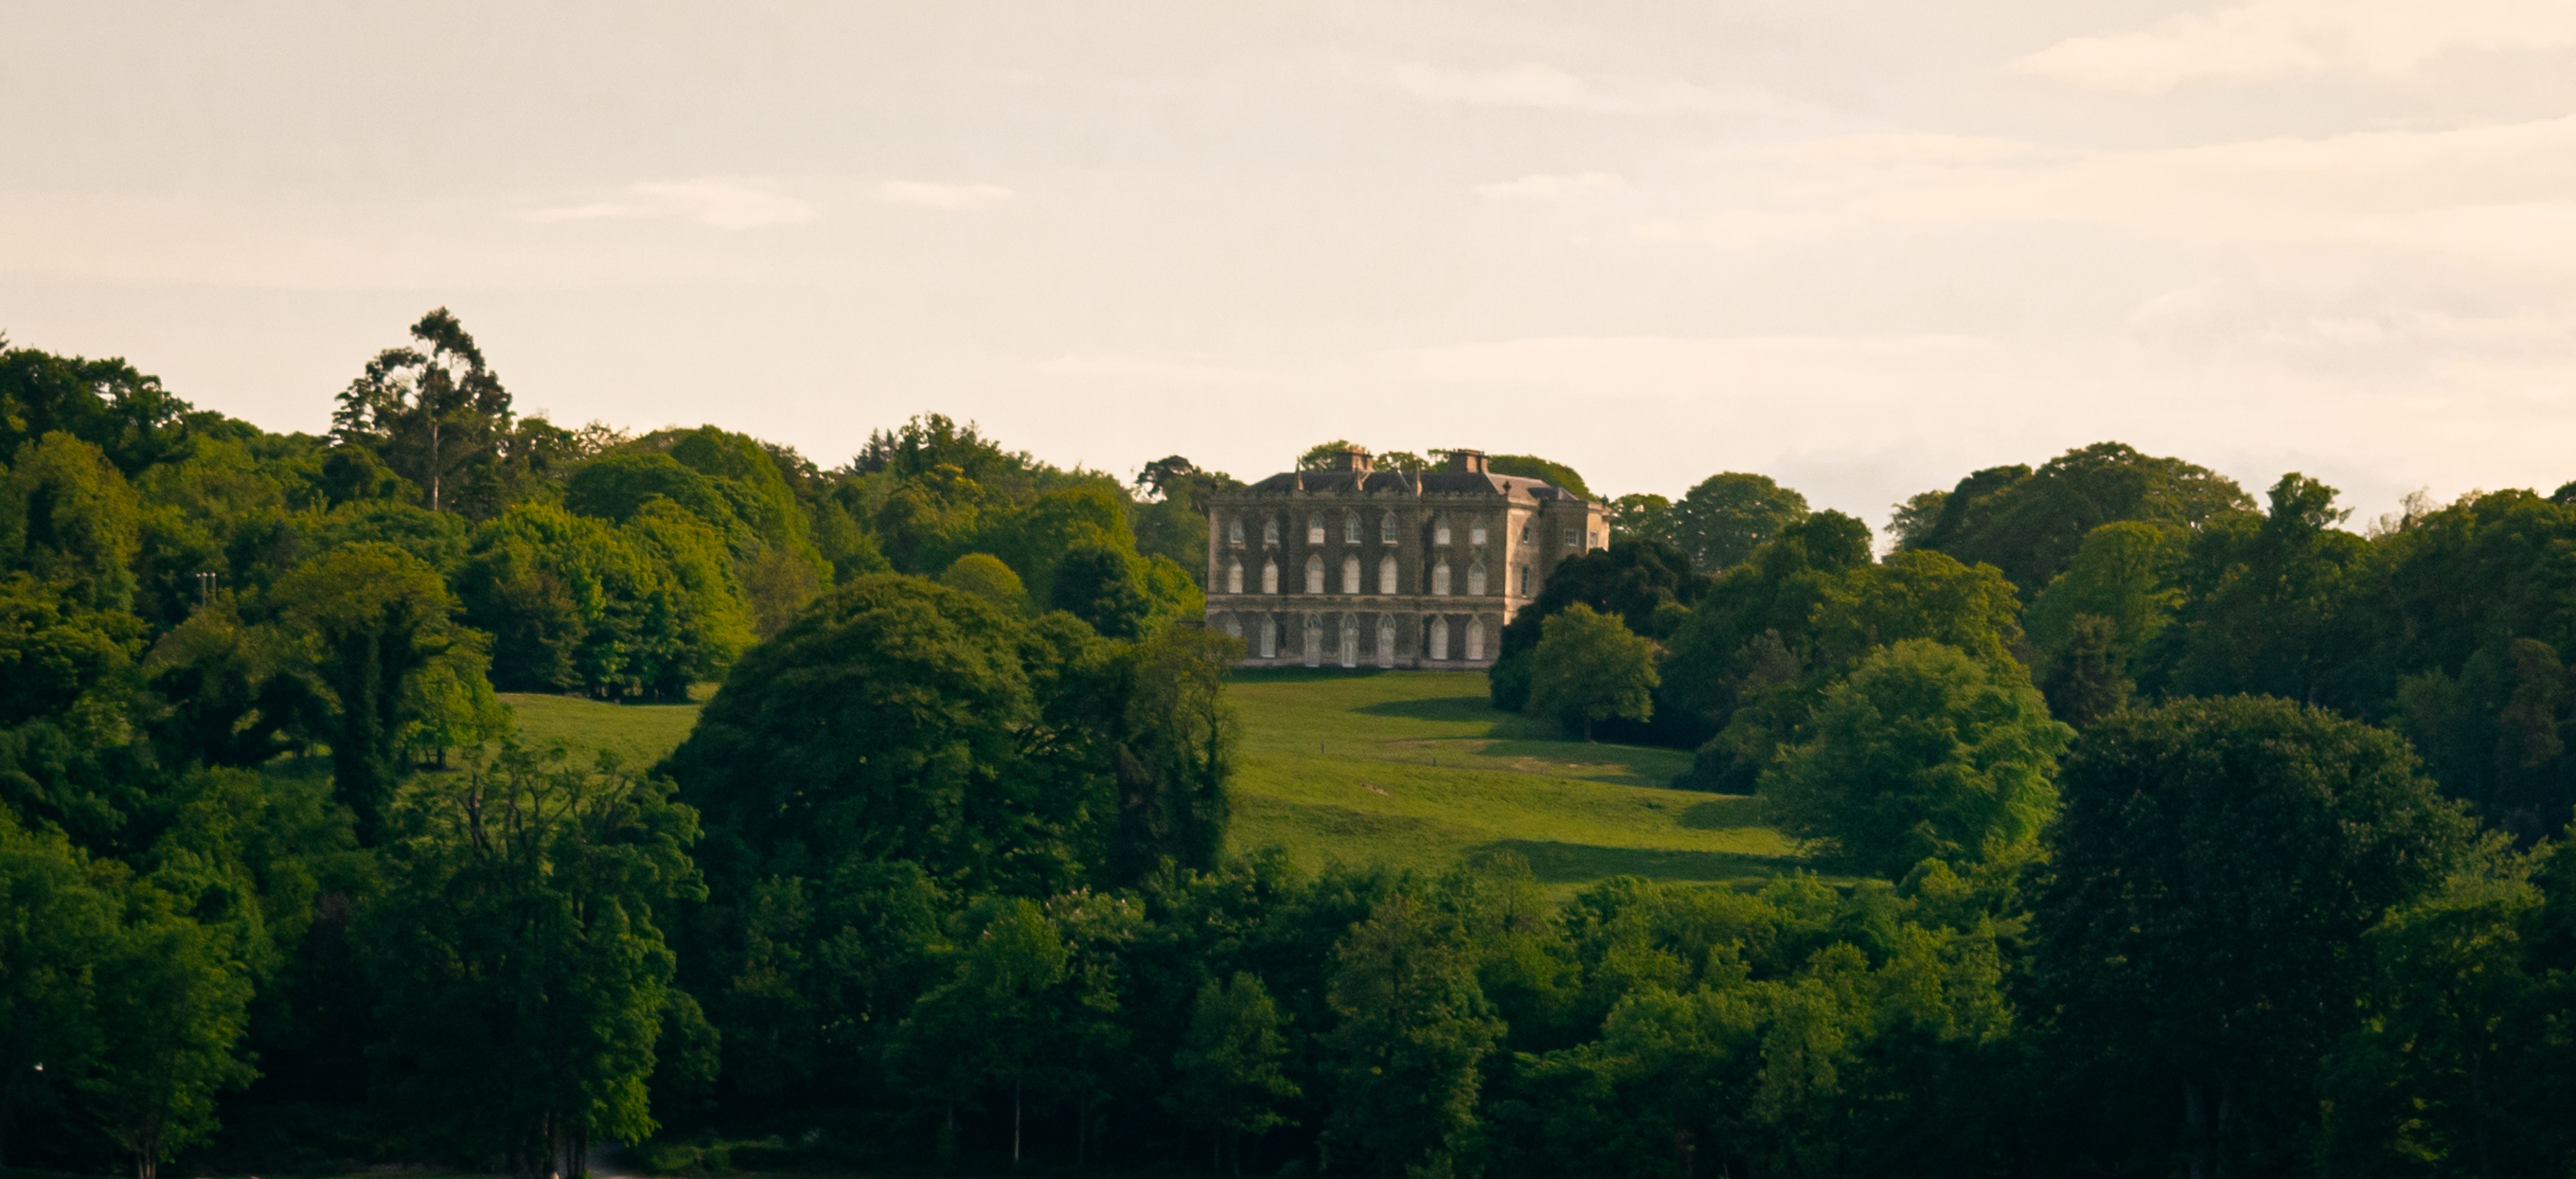 Castle Ward. Photo by Anthony Boyle